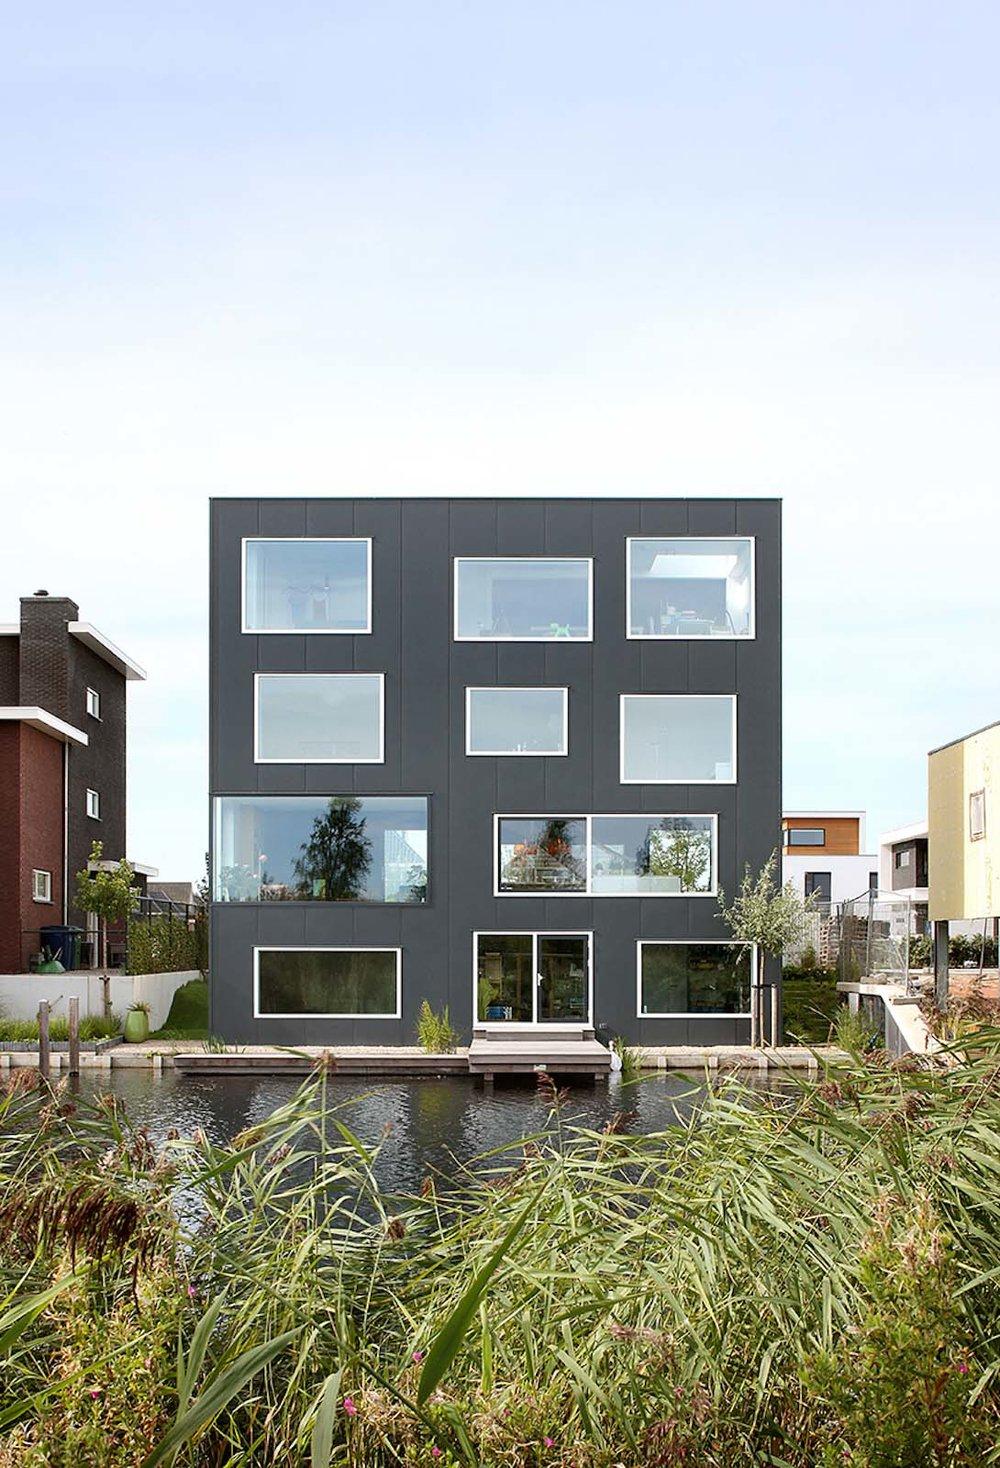 ignant_architecture_mka_woning_almere_small_02.jpg